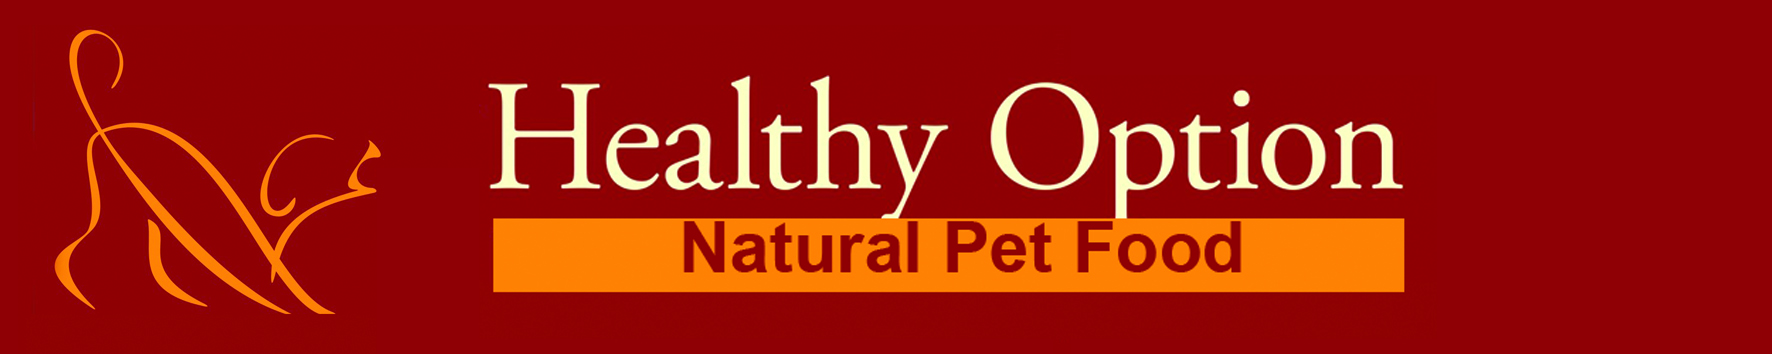 Healthy Option Pet Food Logo